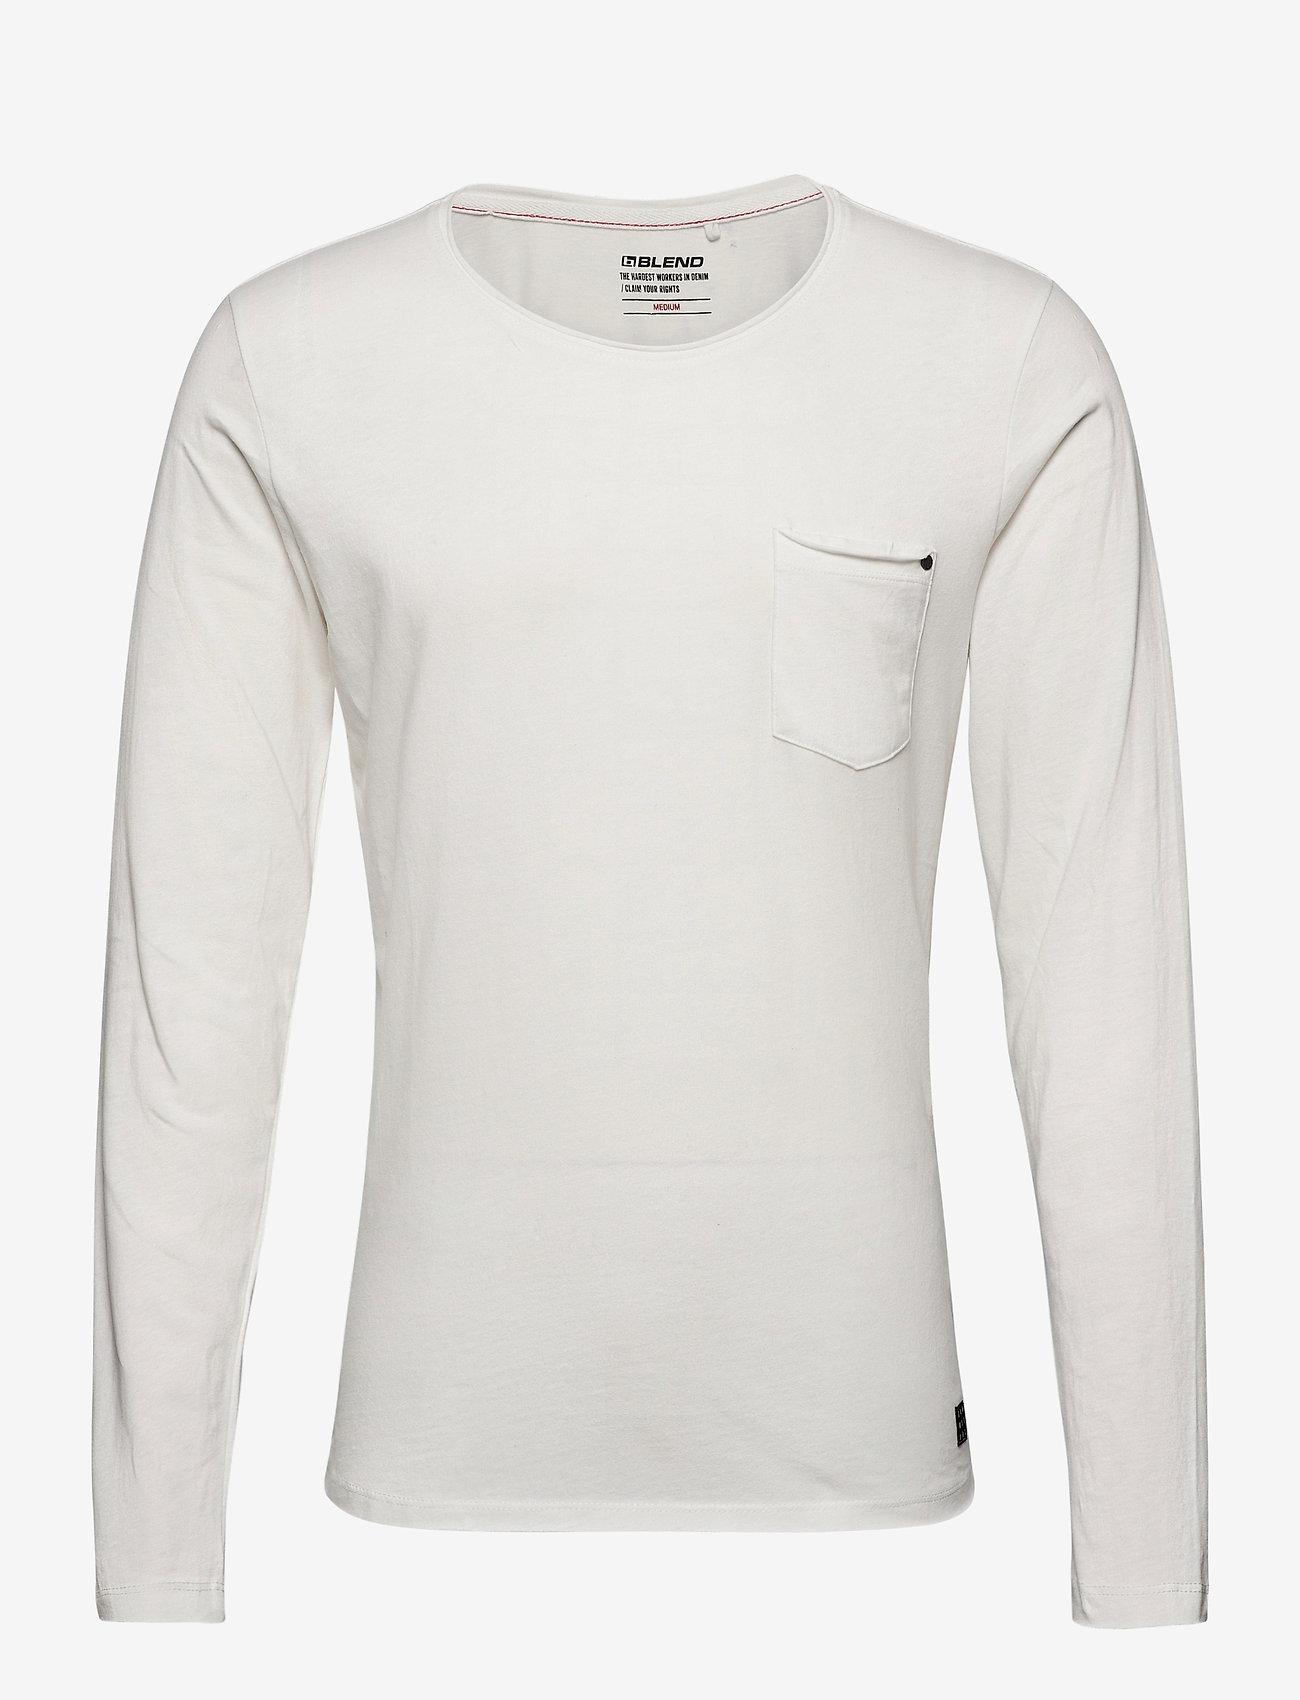 Blend - Tee - t-shirts basiques - snow white - 0